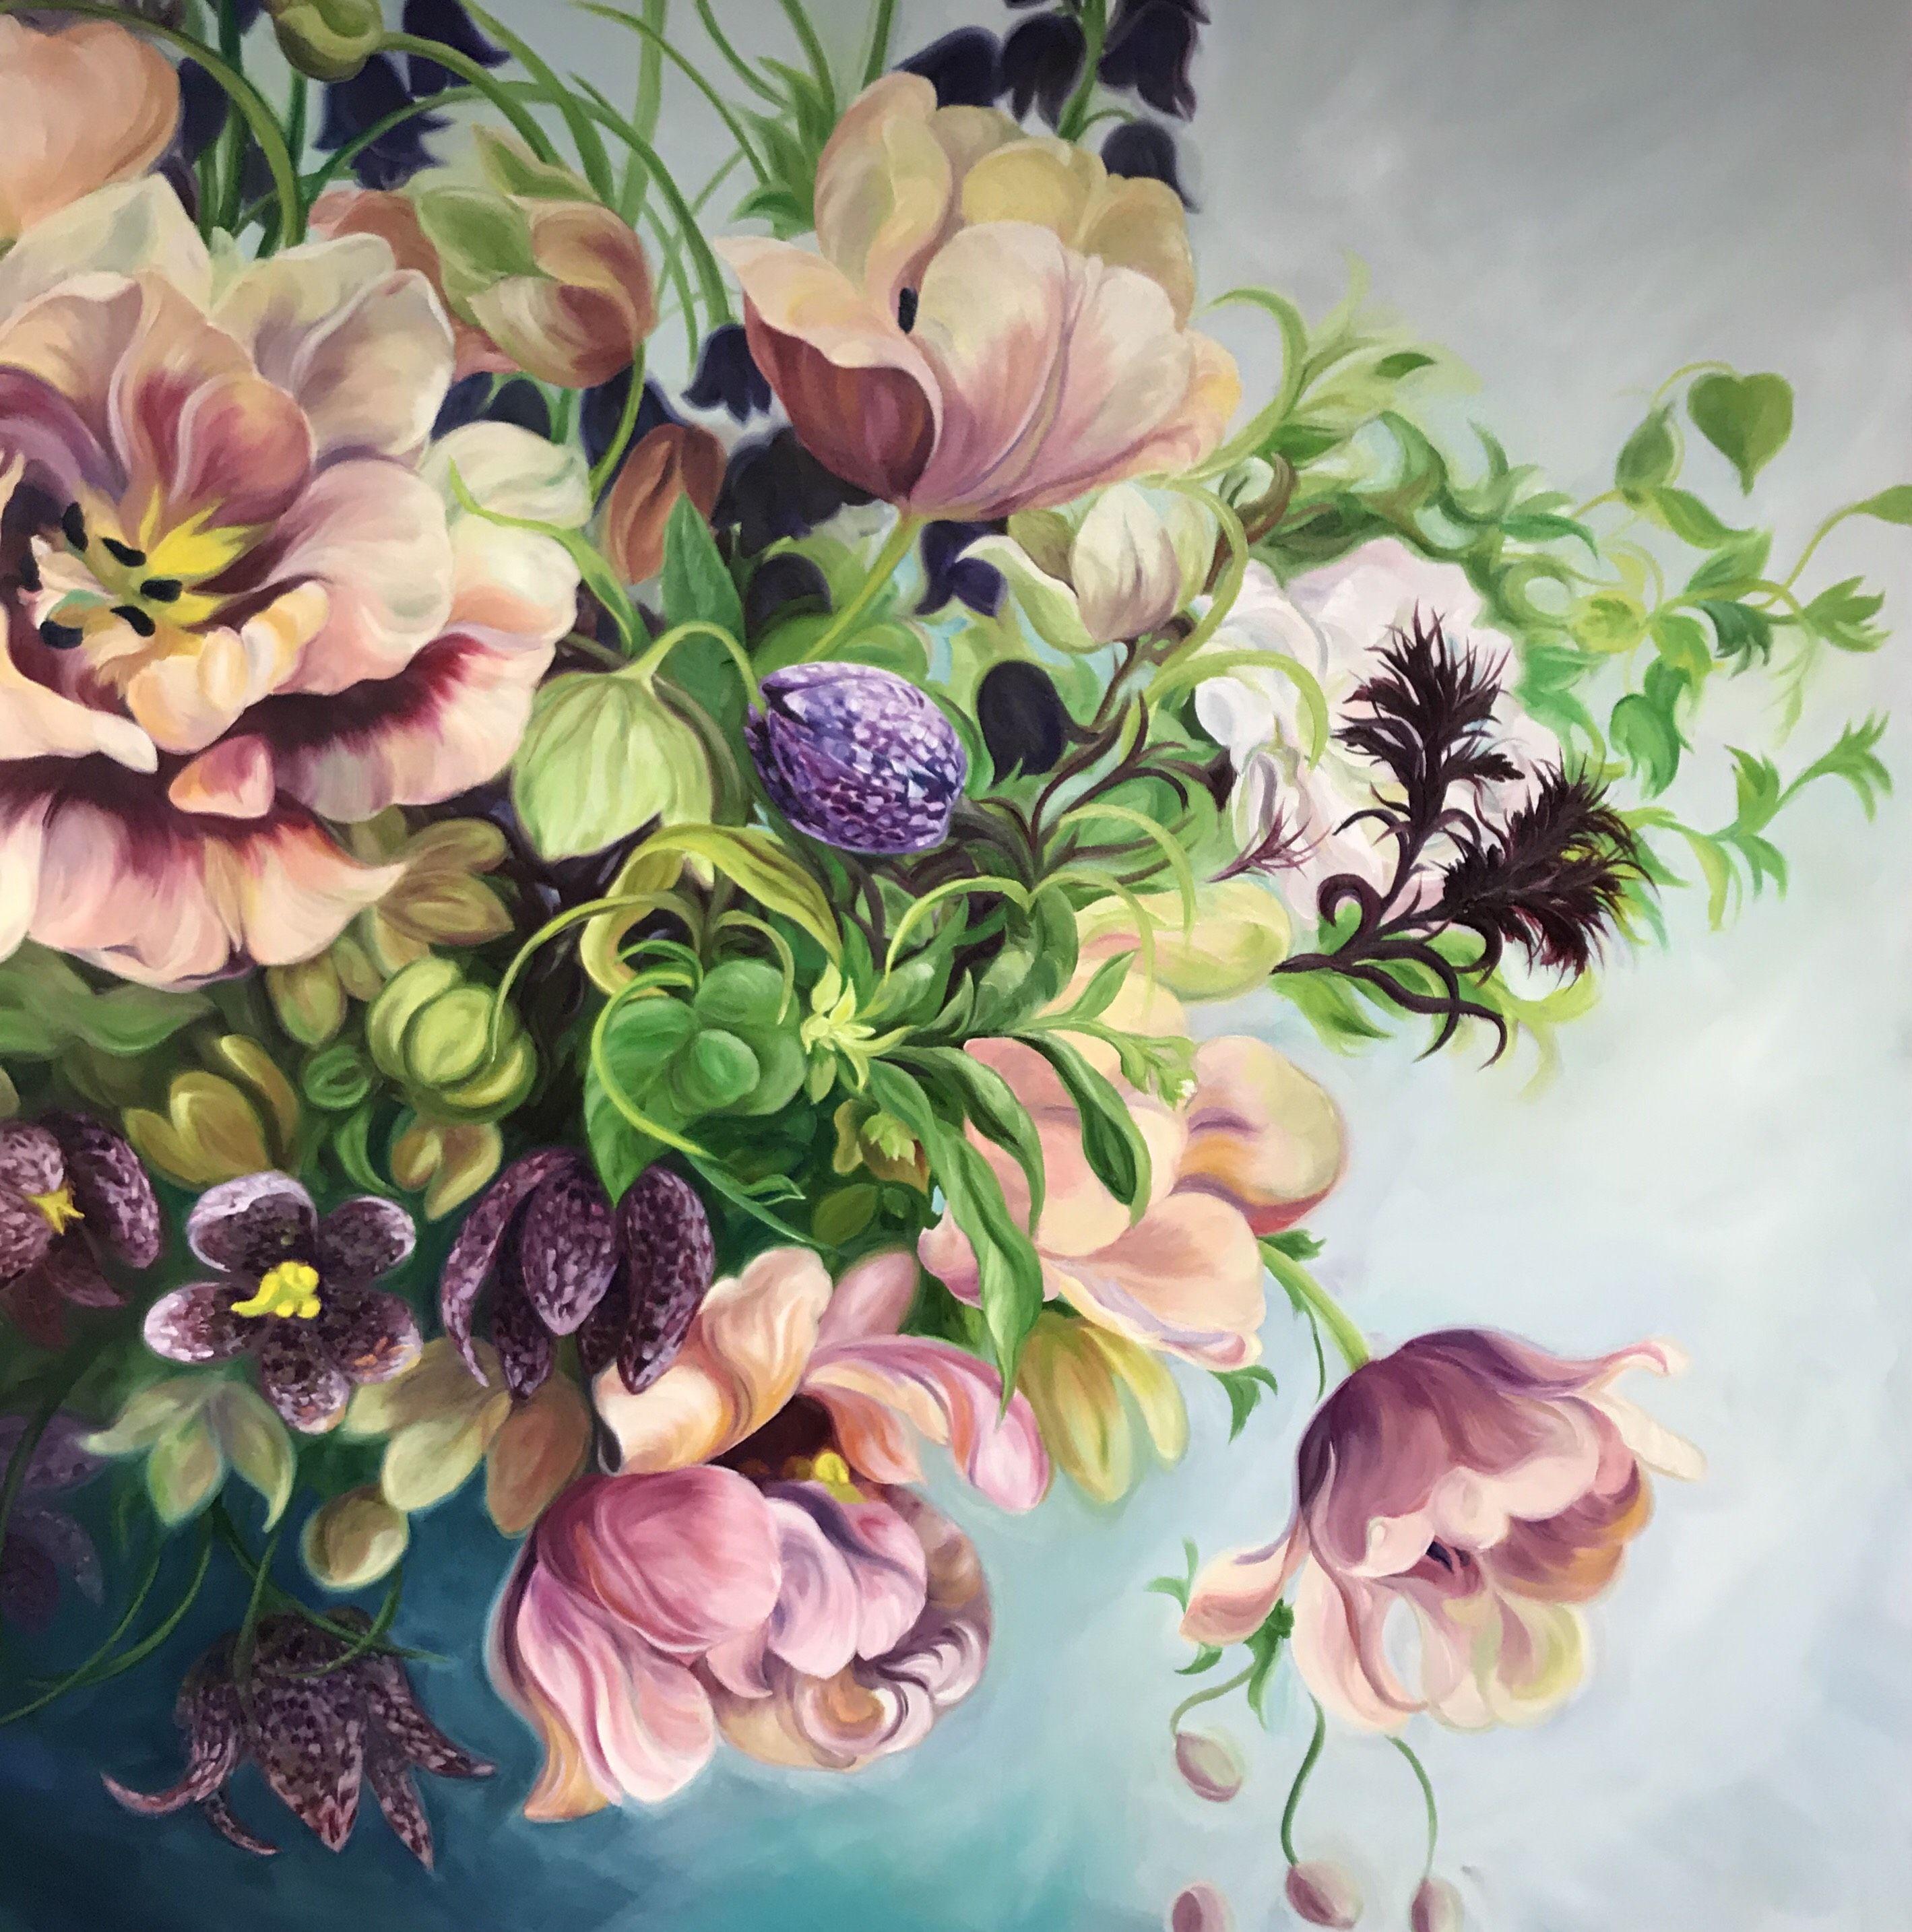 Case Study Flower Painter Anita Nowinska On Leveraging Influencers Online Marketing For Artists Flower Painting Flower Bouquet Painting Flower Painting Original